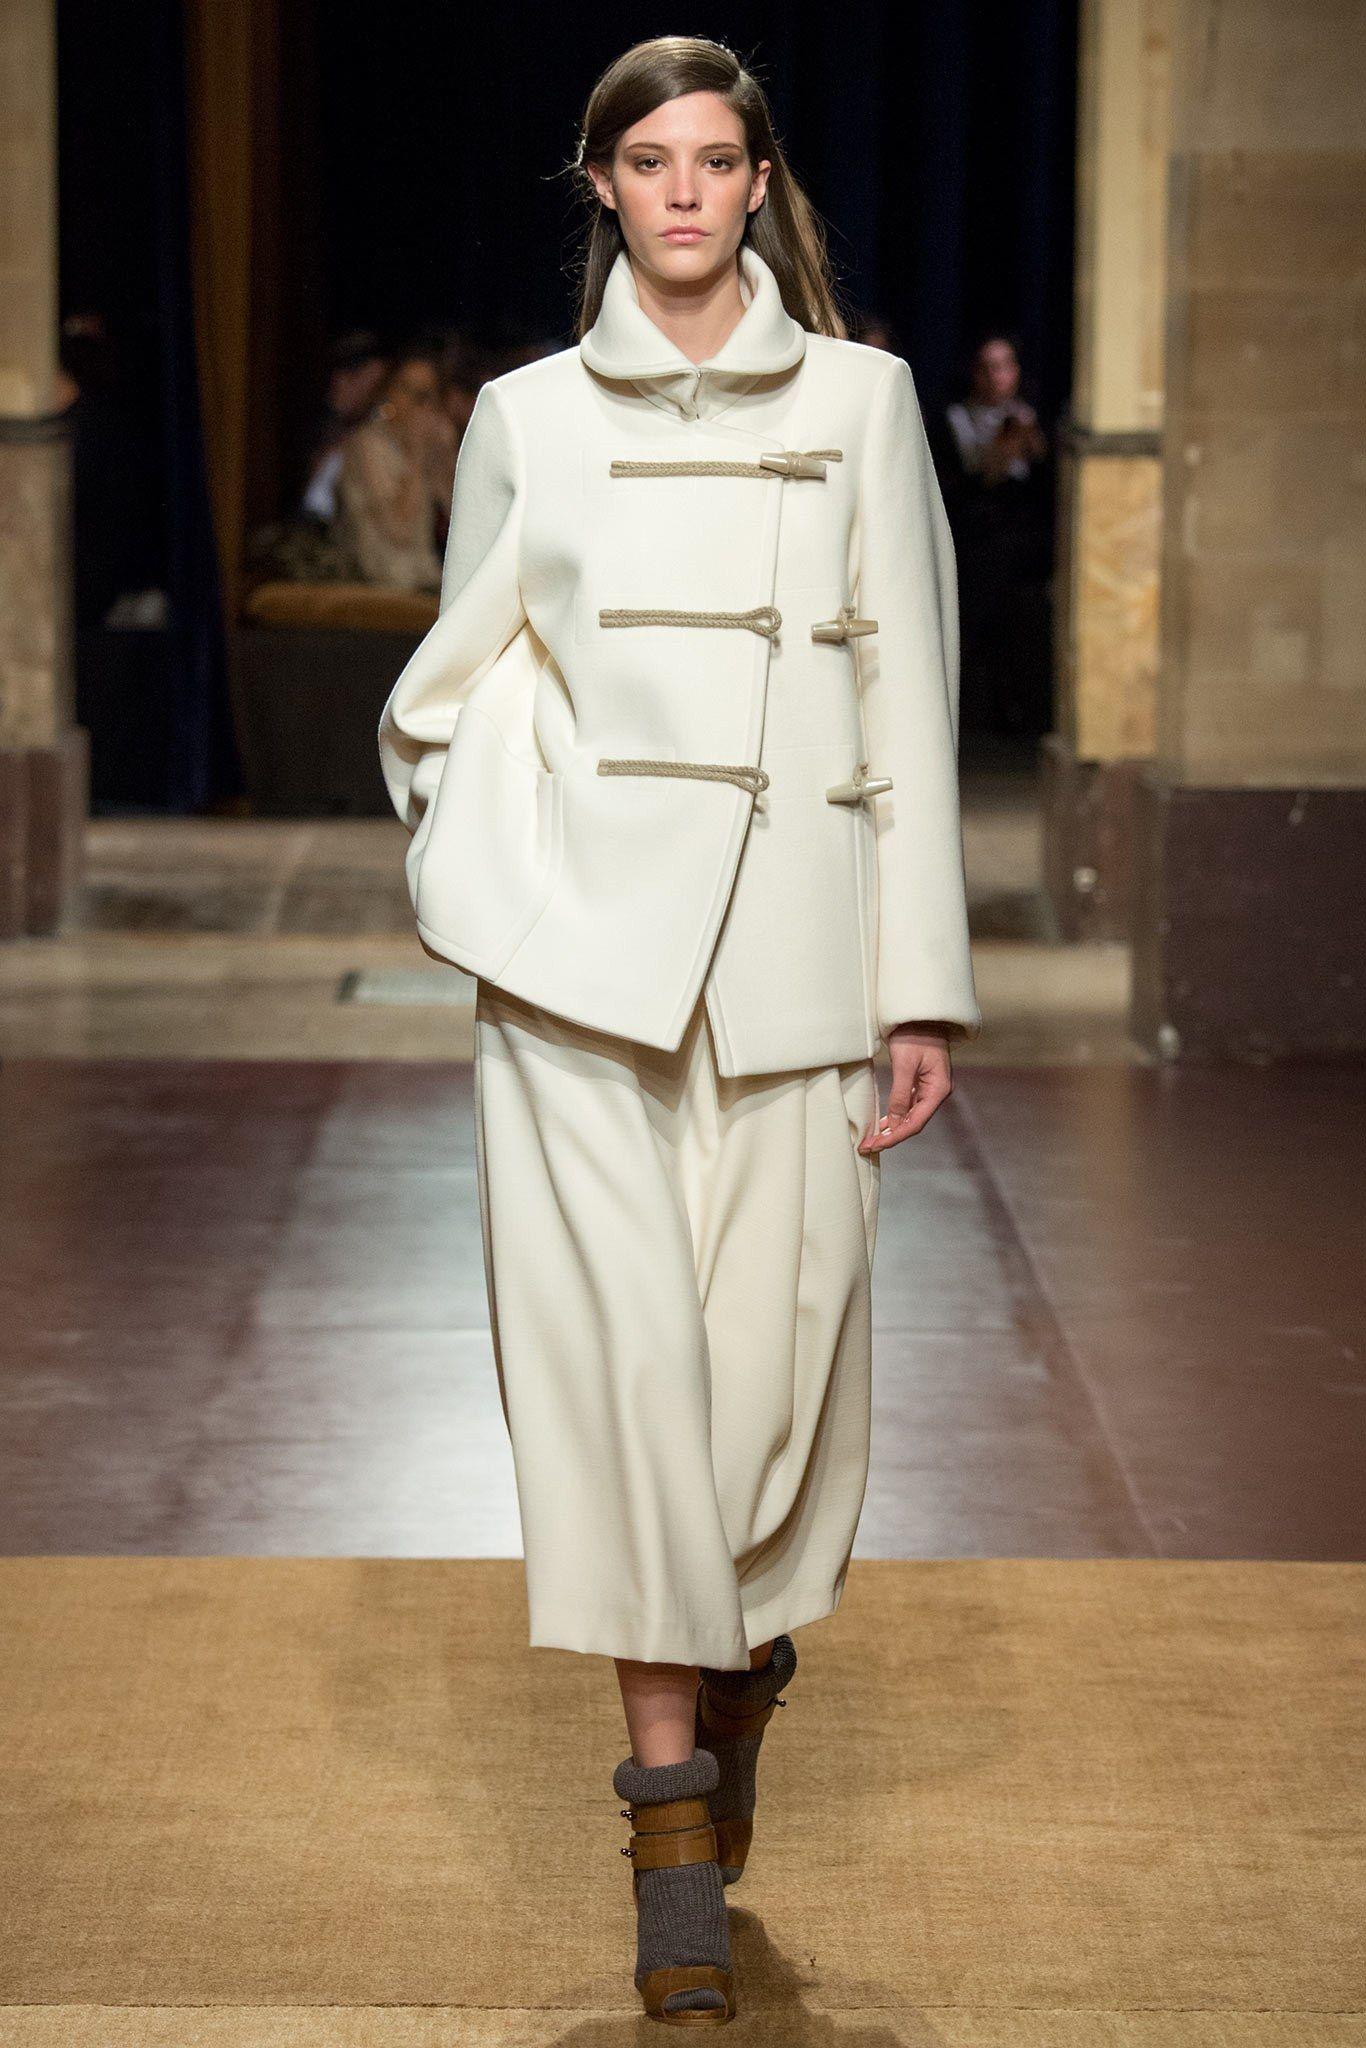 e07a518c25 Hermès Fall 2014 Ready-to-Wear Fashion Show in 2019 | Clothes I like ...